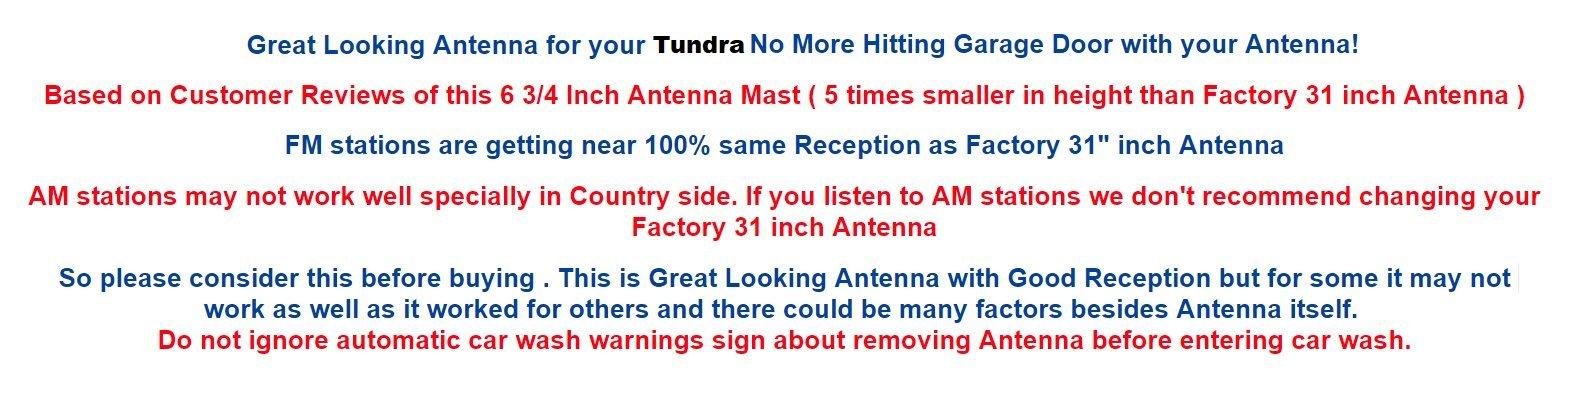 6 3/4'' Antenna MAST - FITS : Toyota Tundra 2007 08 09 10 11 12 13 14 15 2016 2017 2018